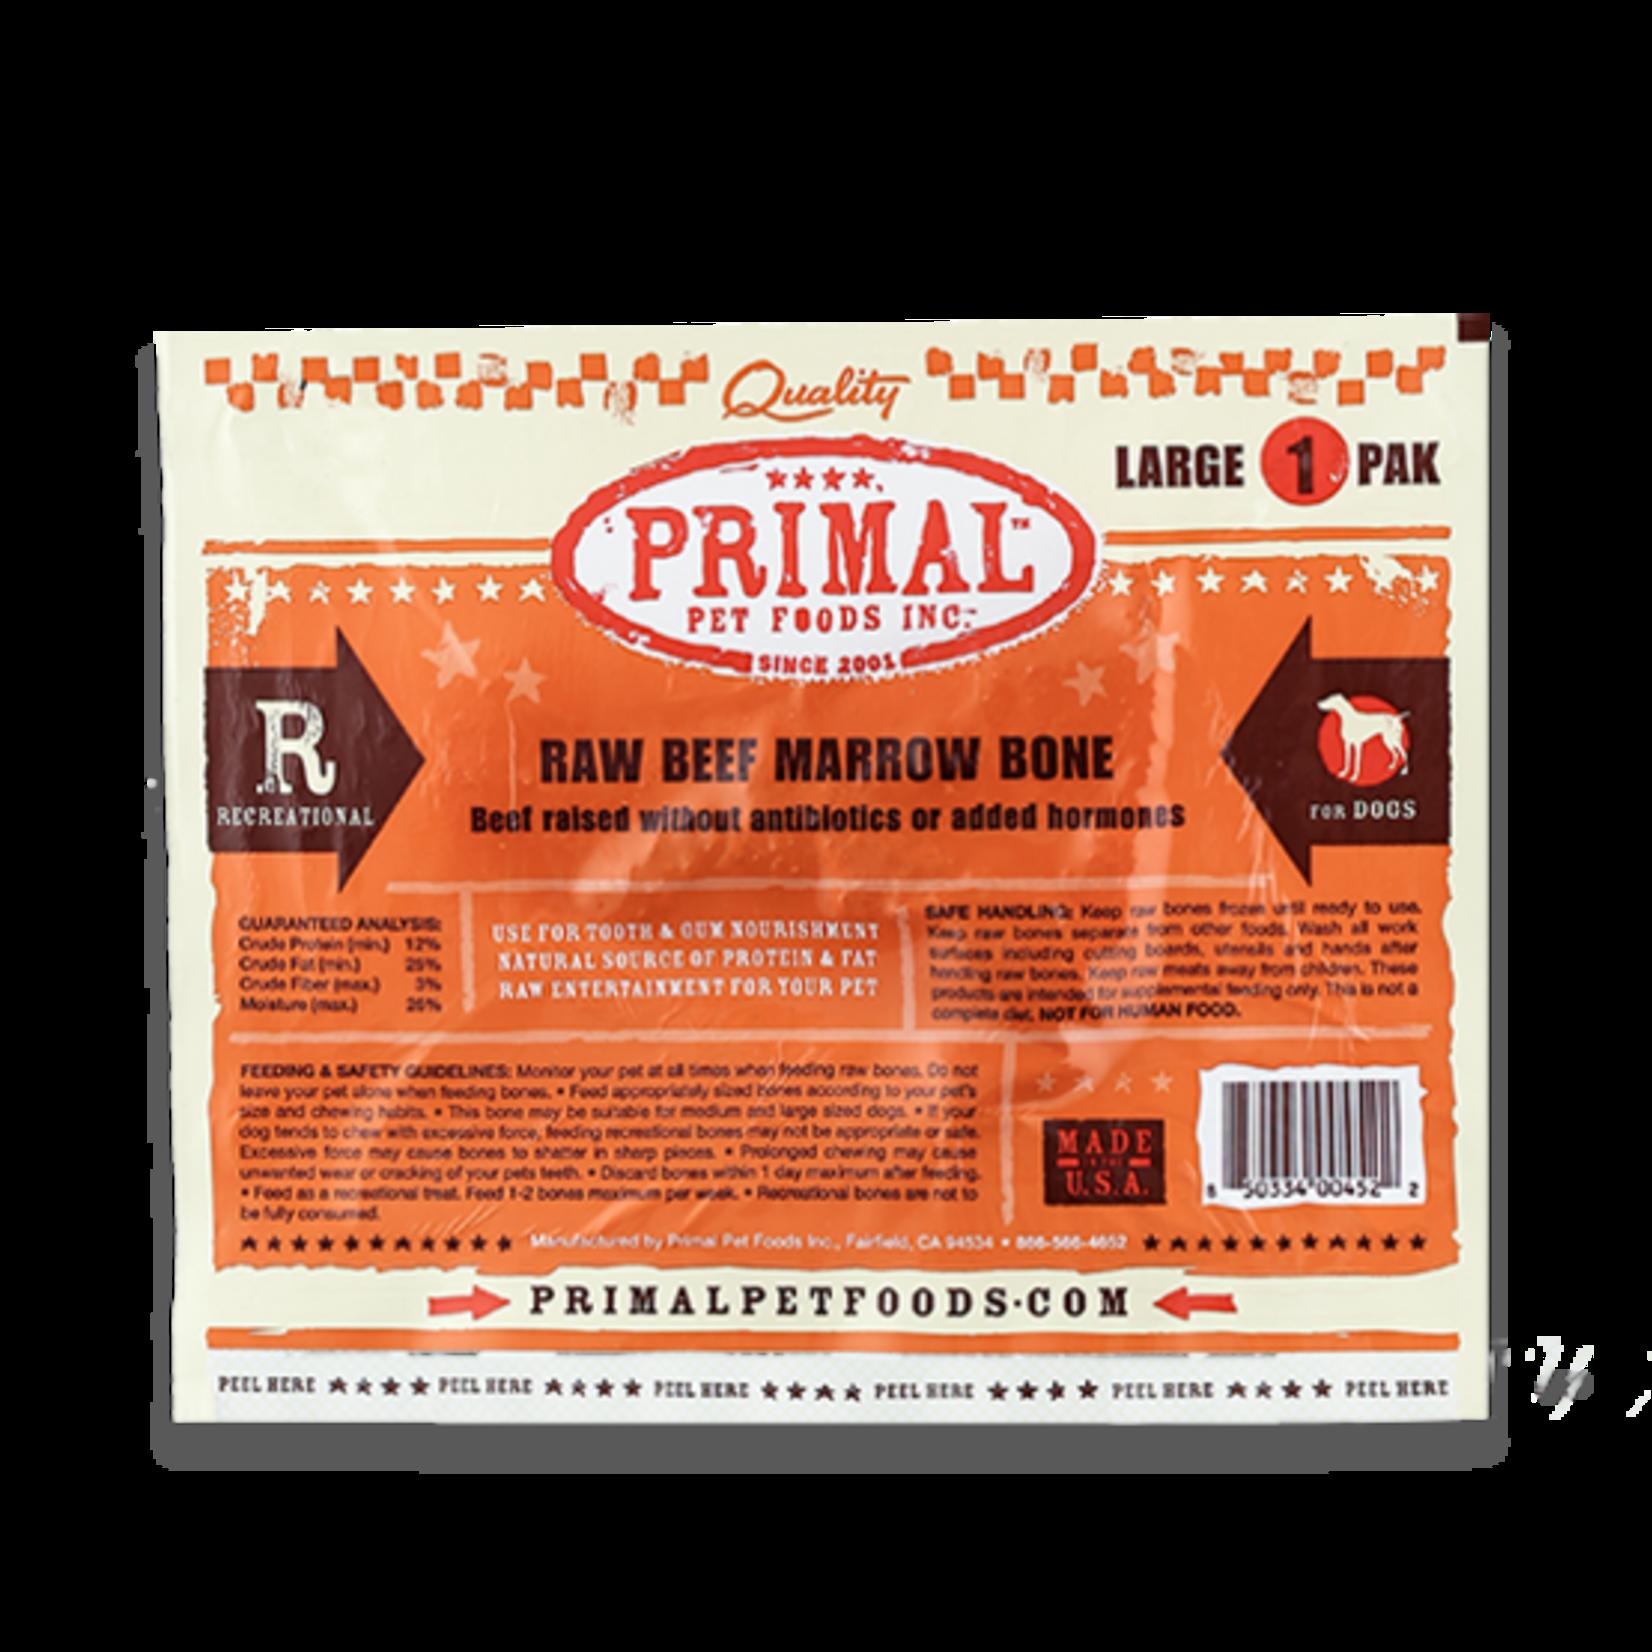 Primal Pet Foods Primal Frozen Raw Beef Bone Large